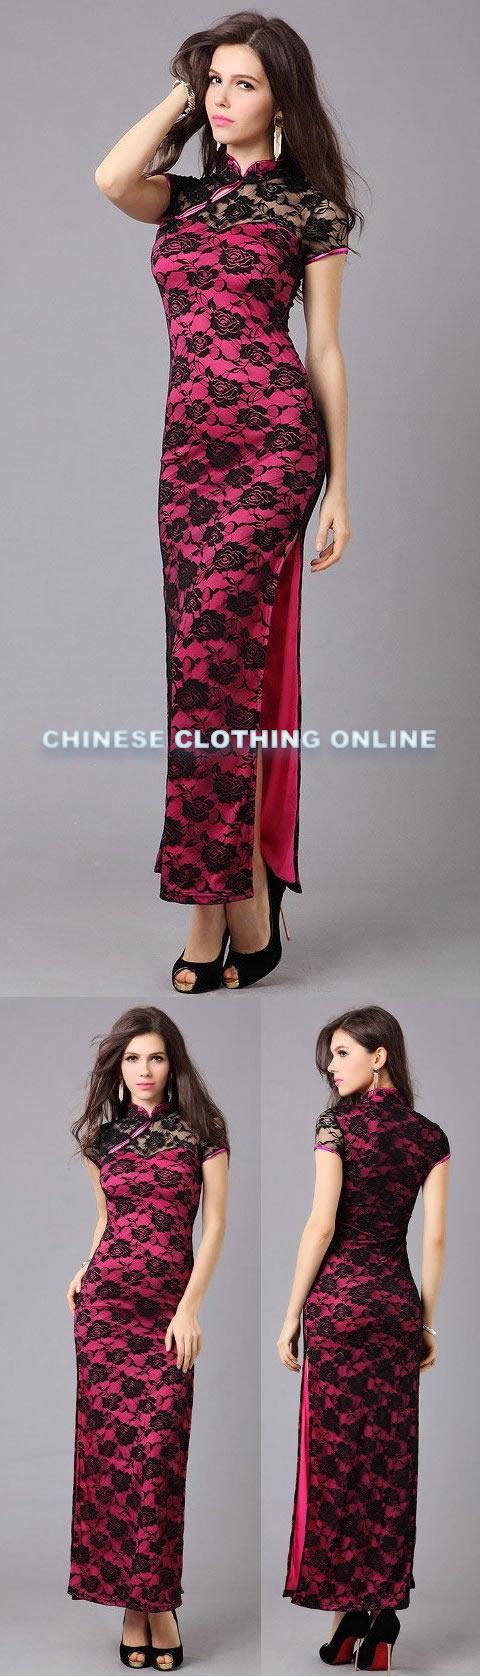 Bargain - Short-sleeve Long-length Cheongsam